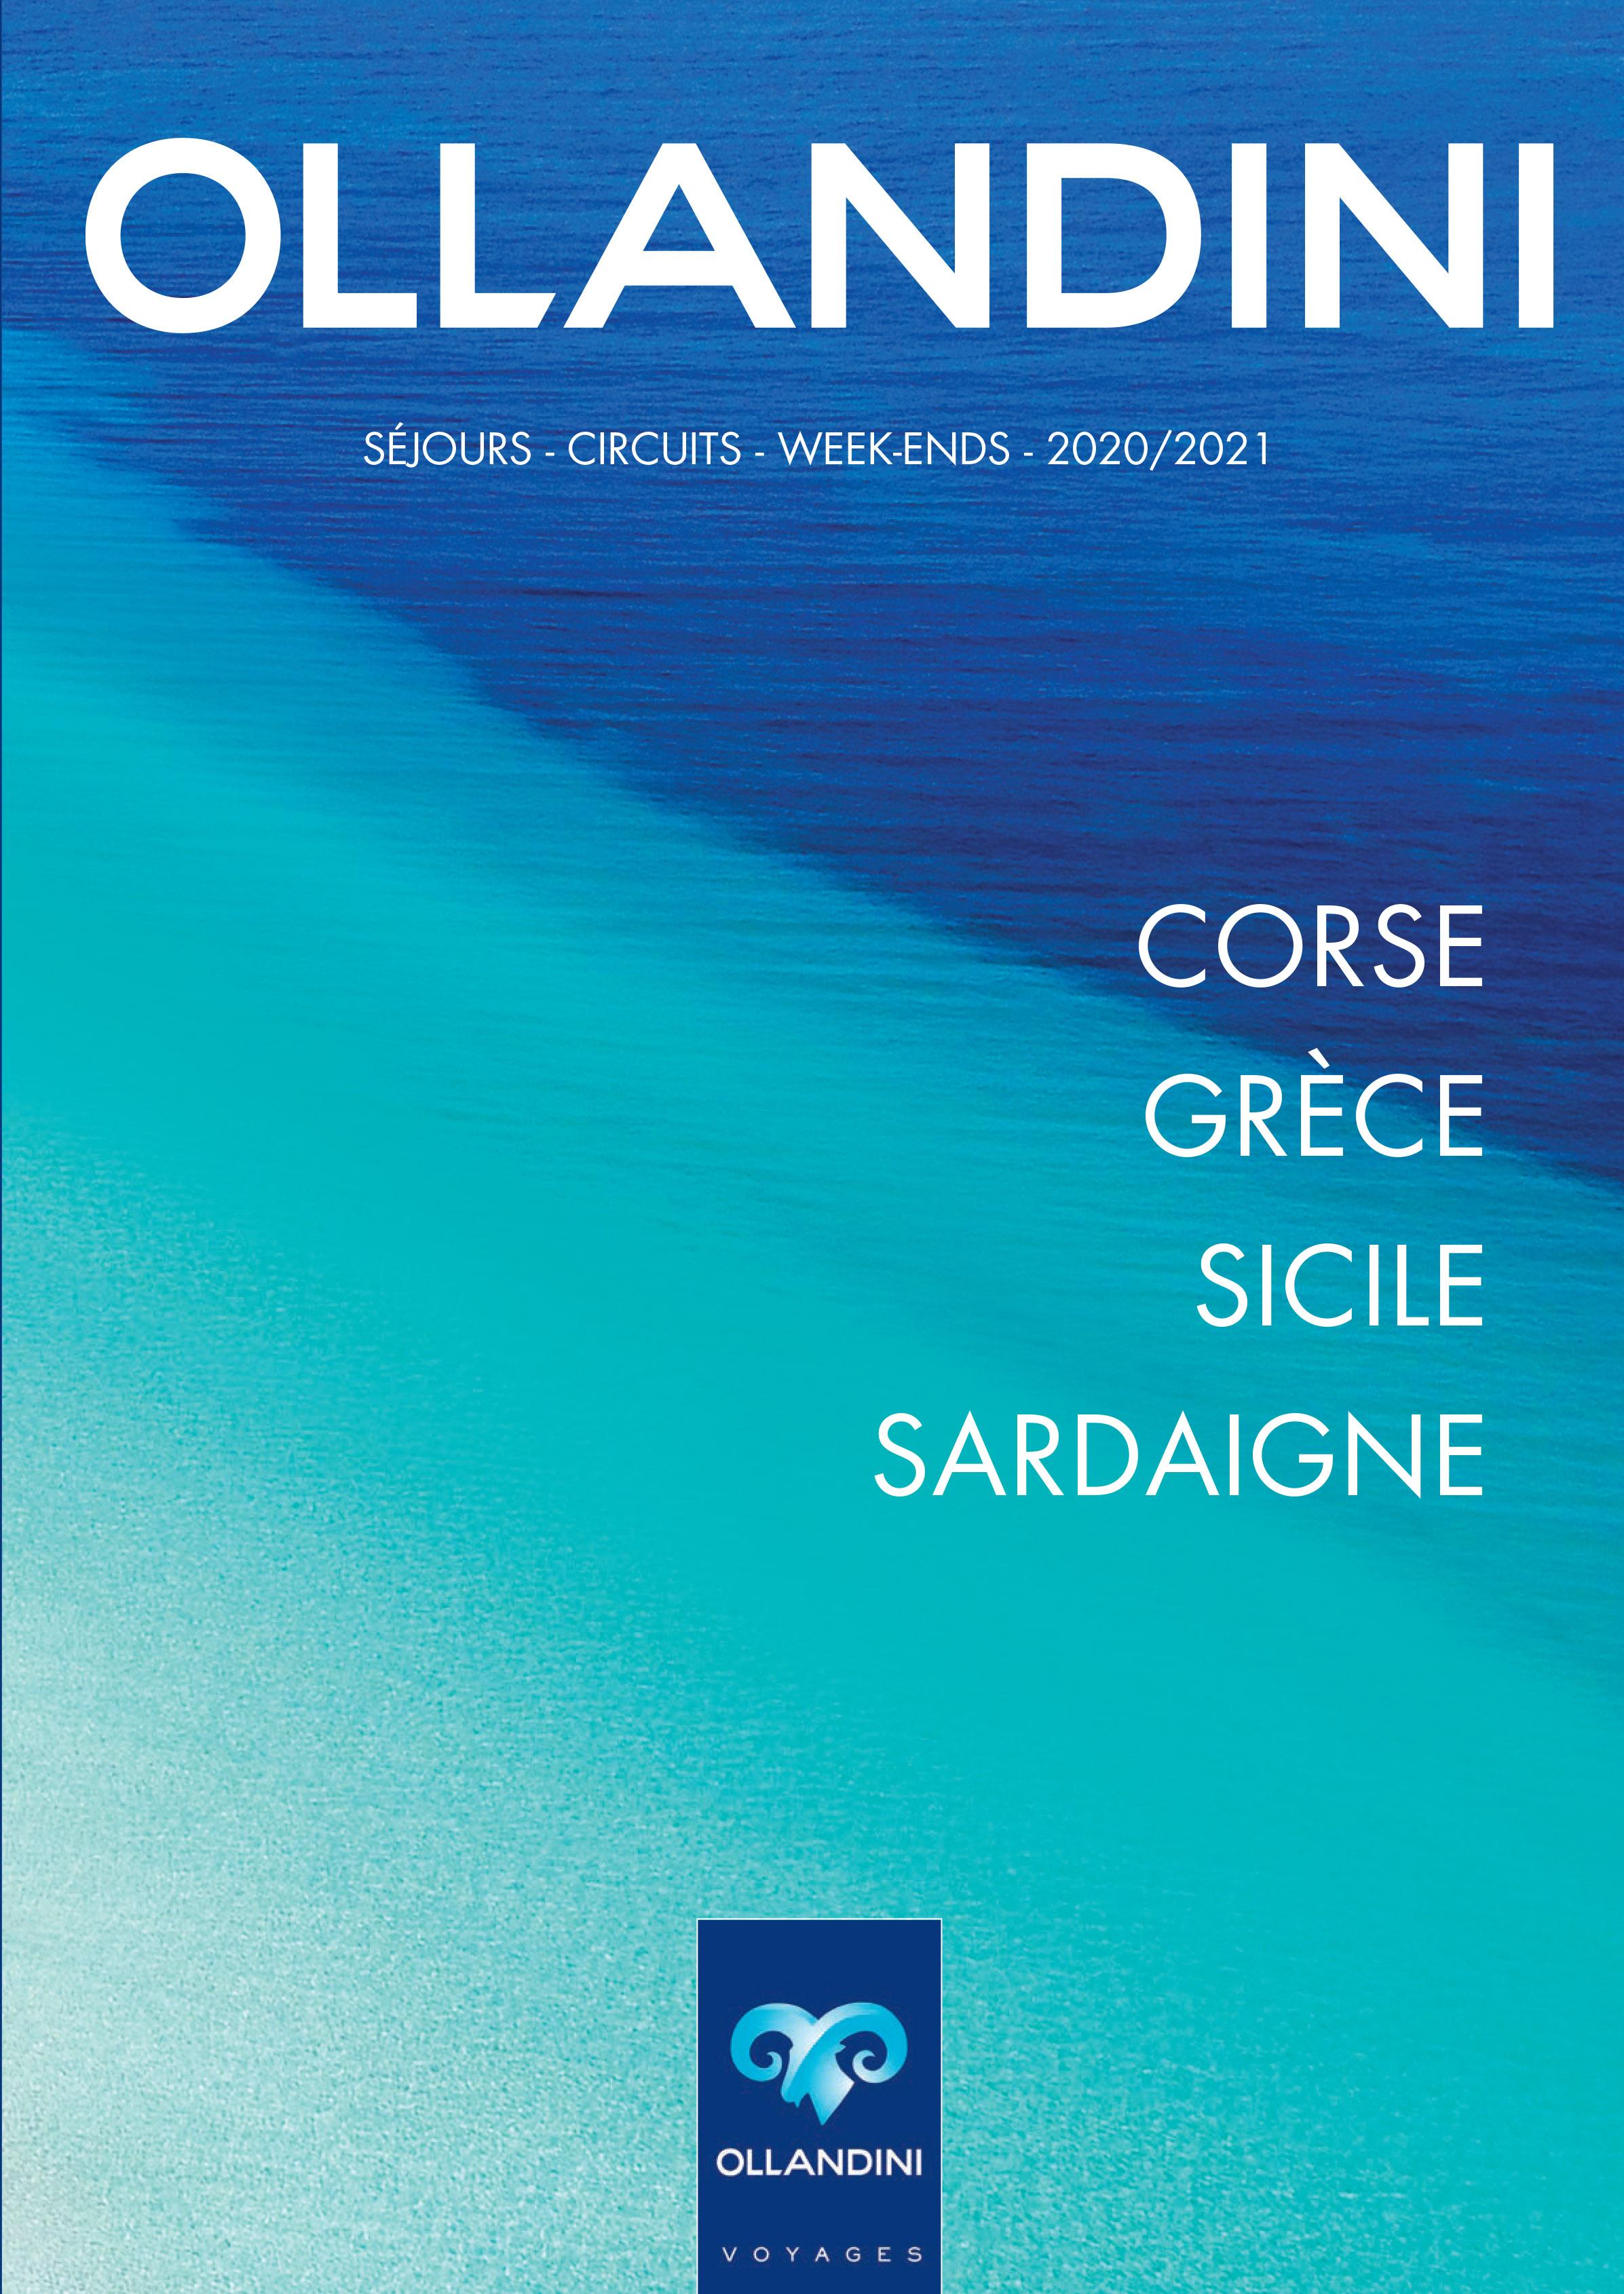 brochure Ollandini Voyages 2020/2021